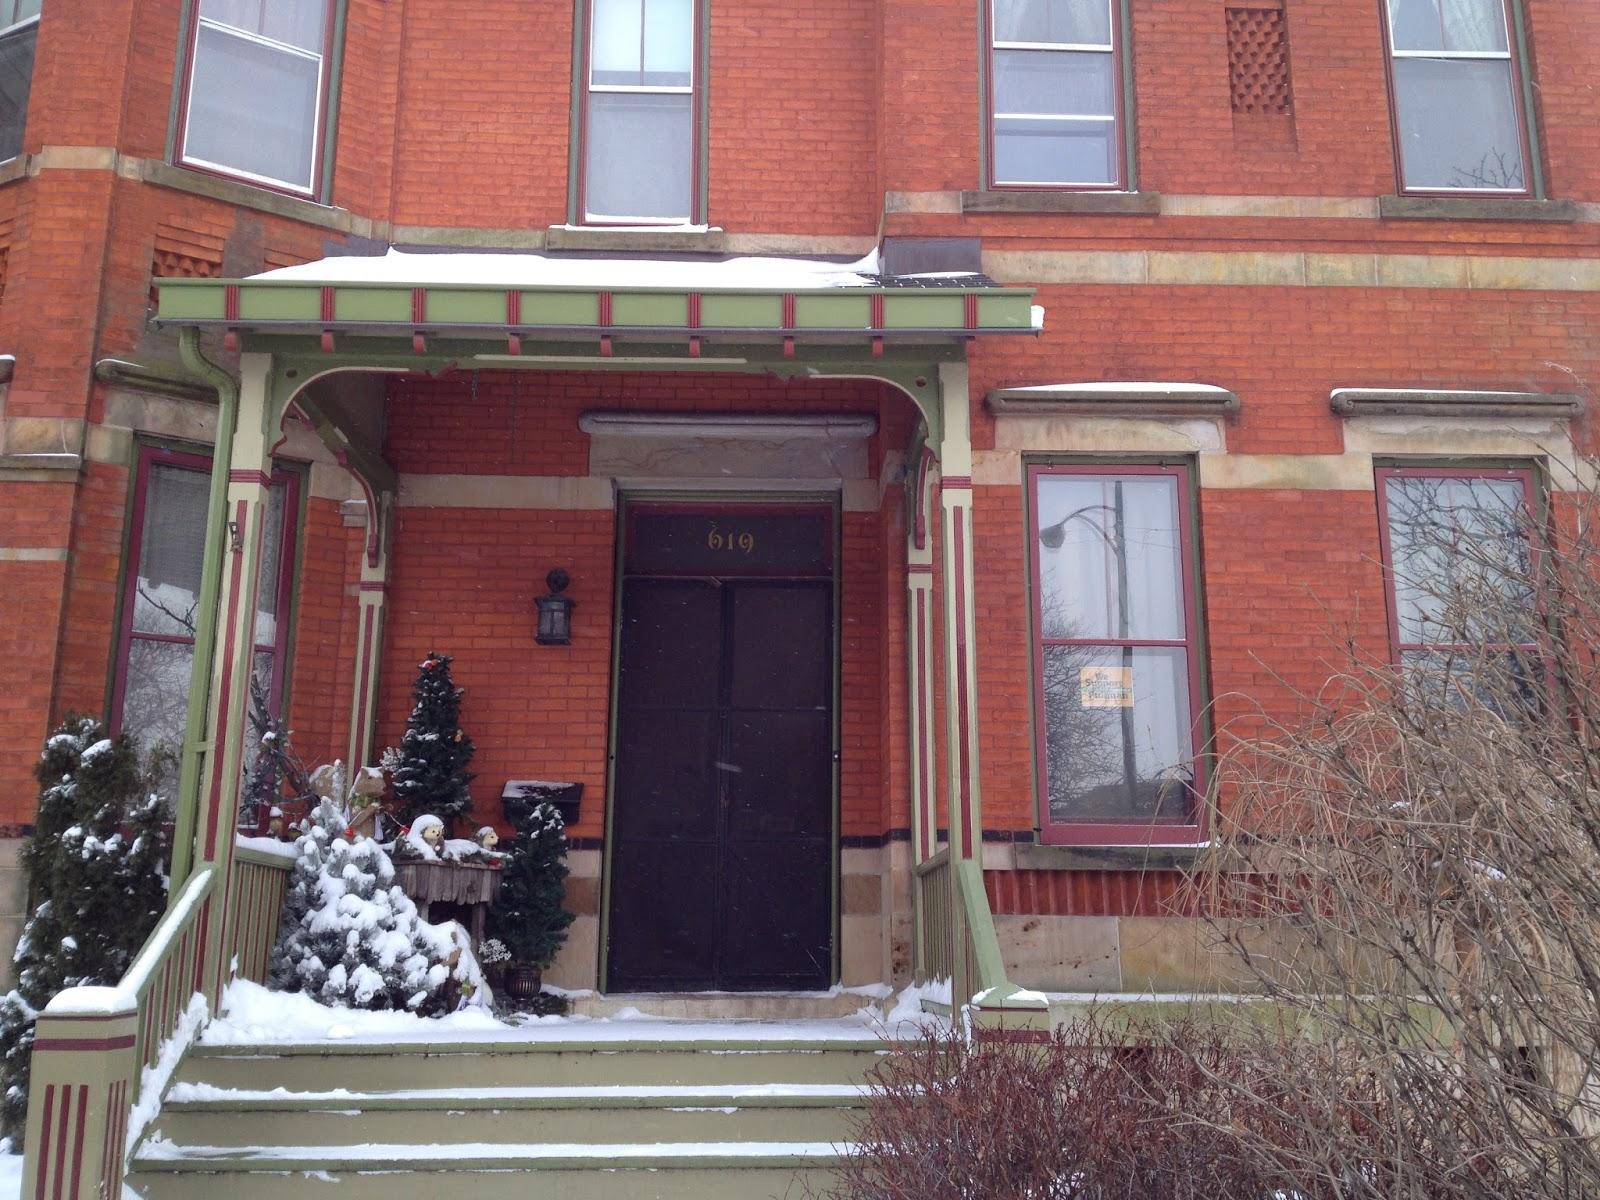 Pullman Red Brick Home